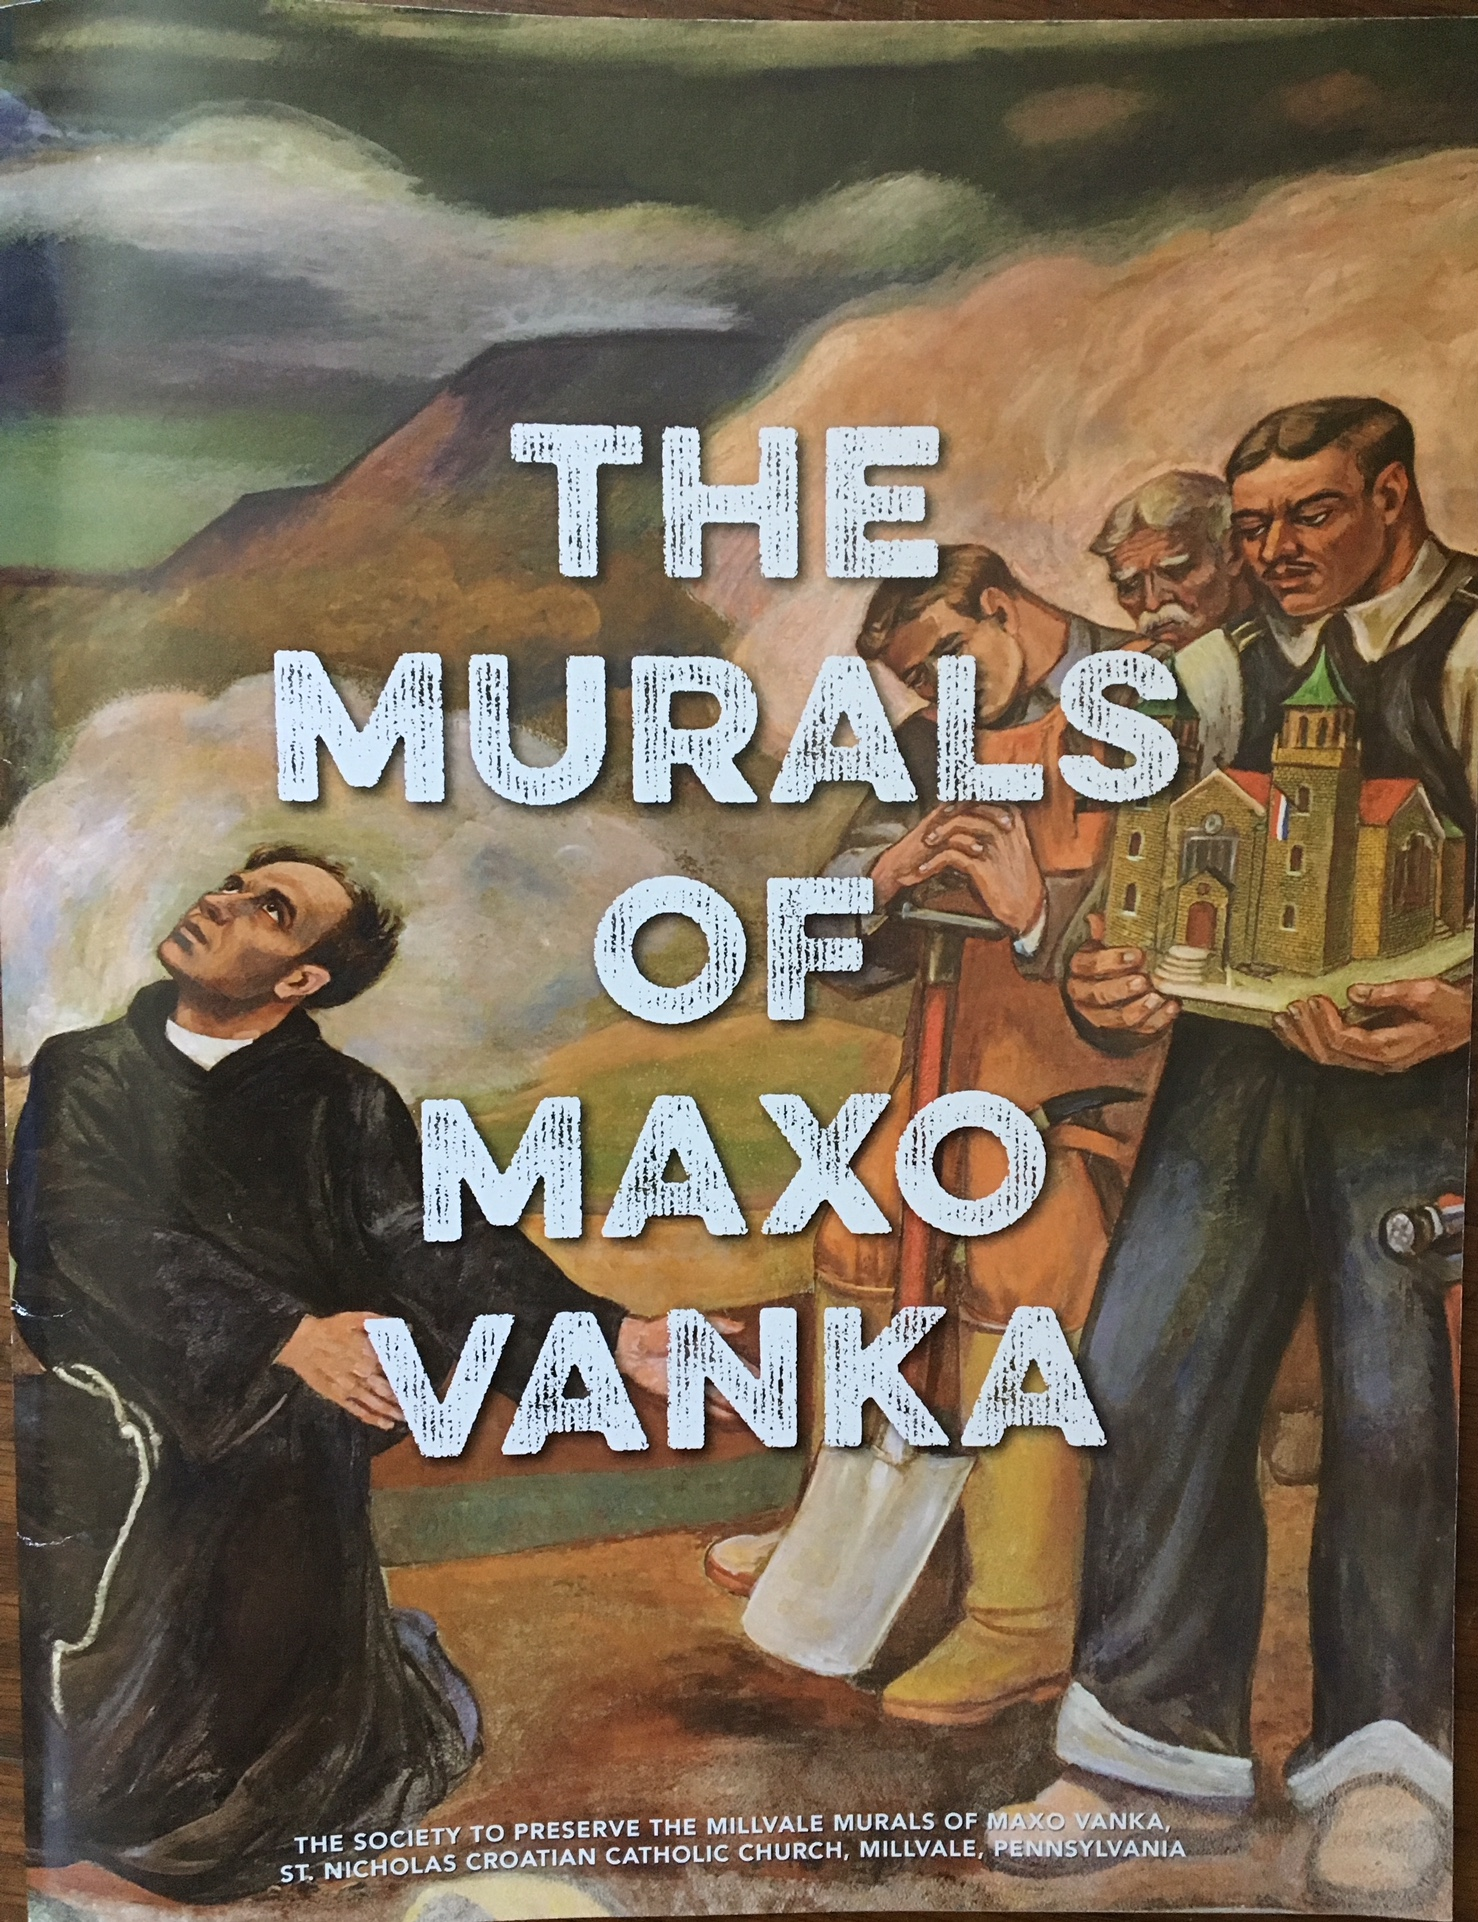 The Murals of Maxo Vanka catalog